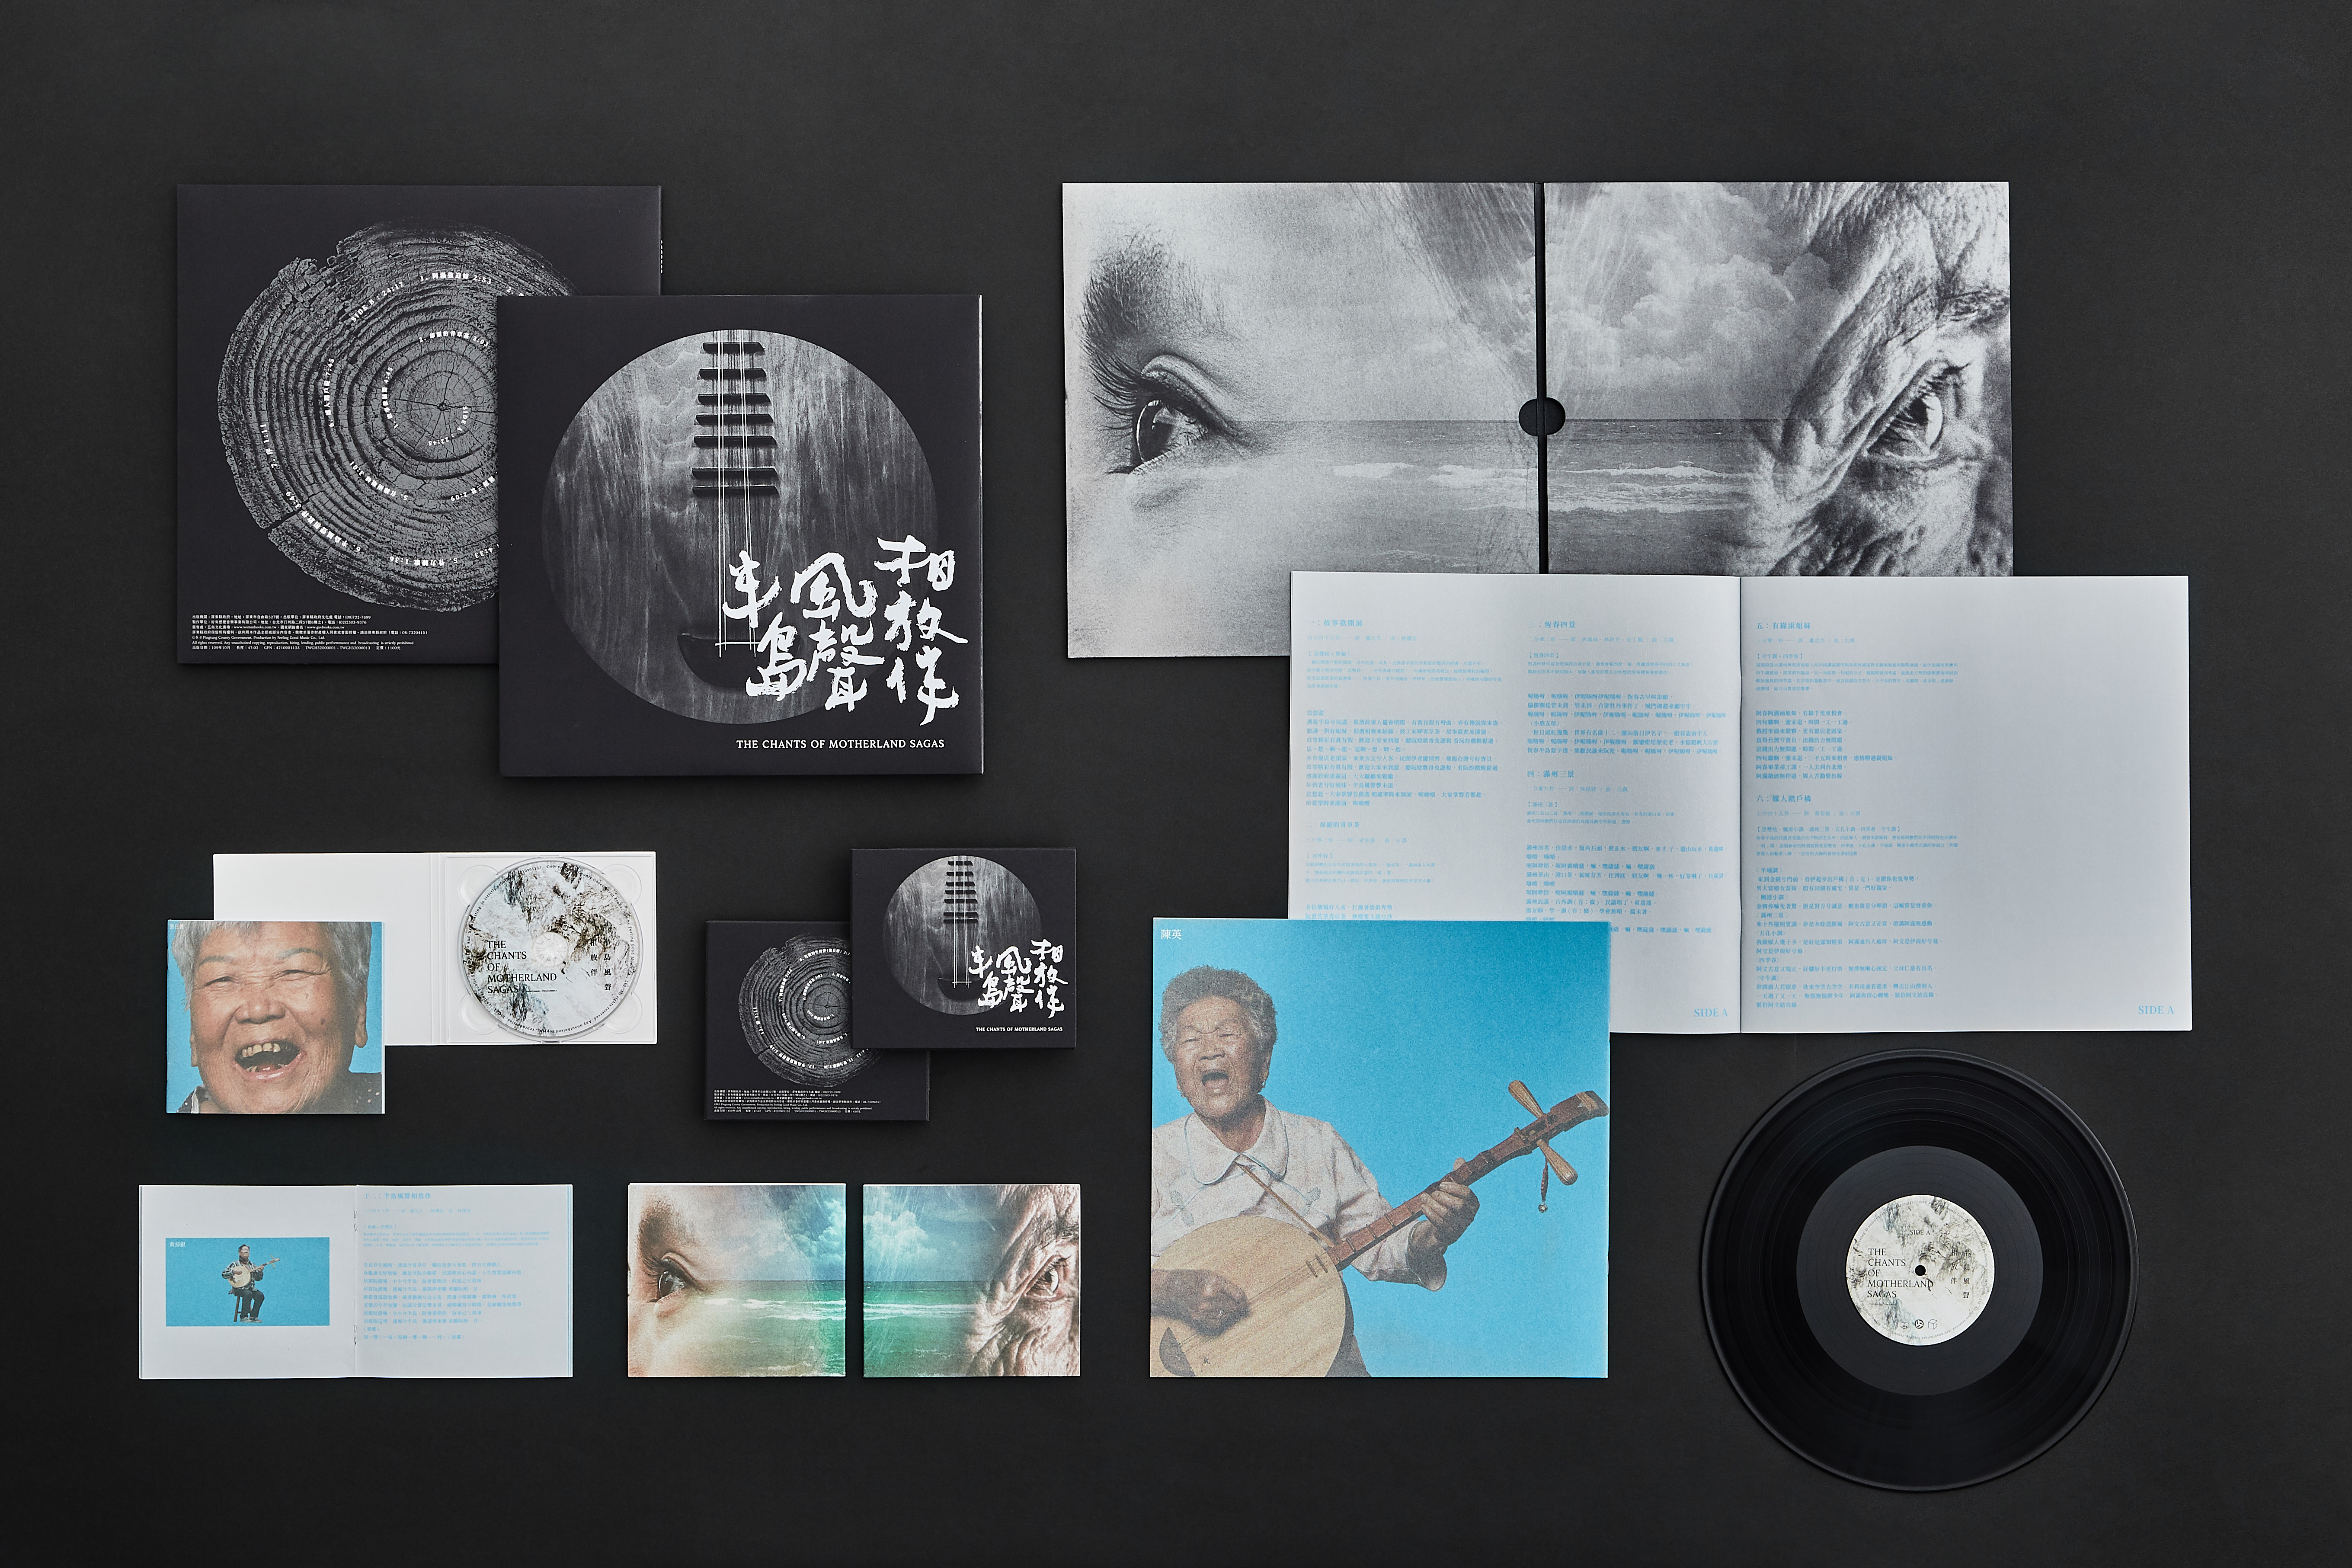 THE CHANTS OF MOTHERLAND SAGAS  CD & RECORD ALBUM